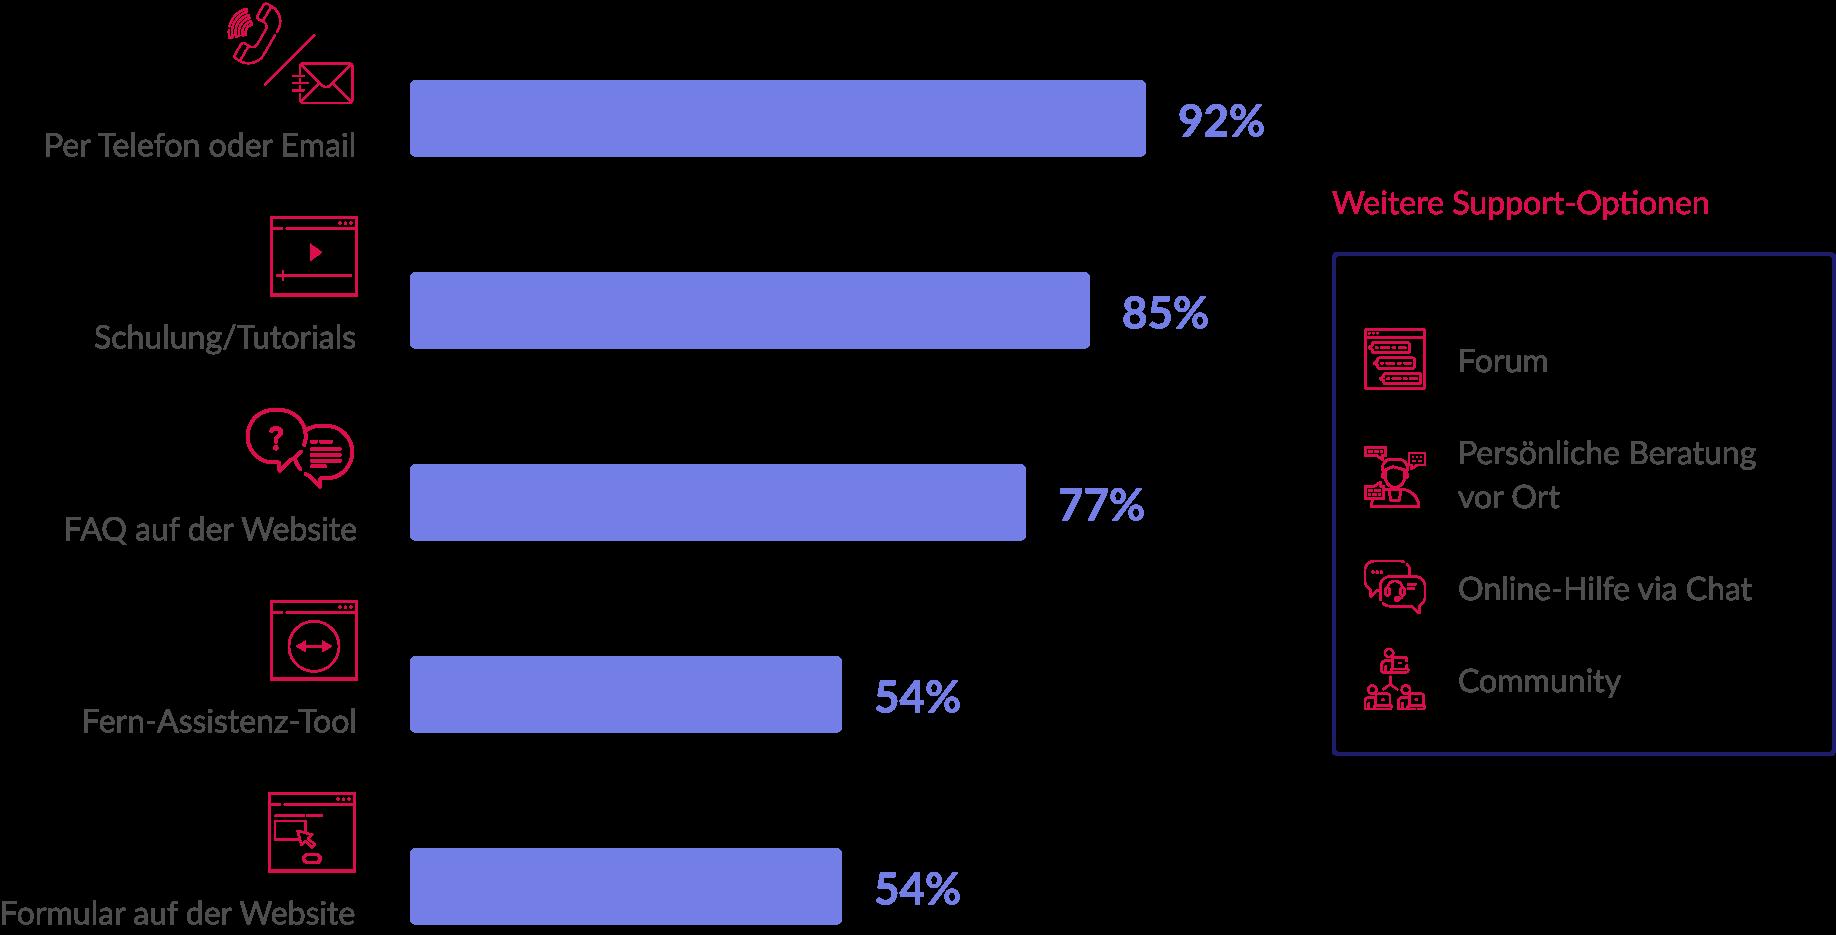 Anteil der Software-Anbieter